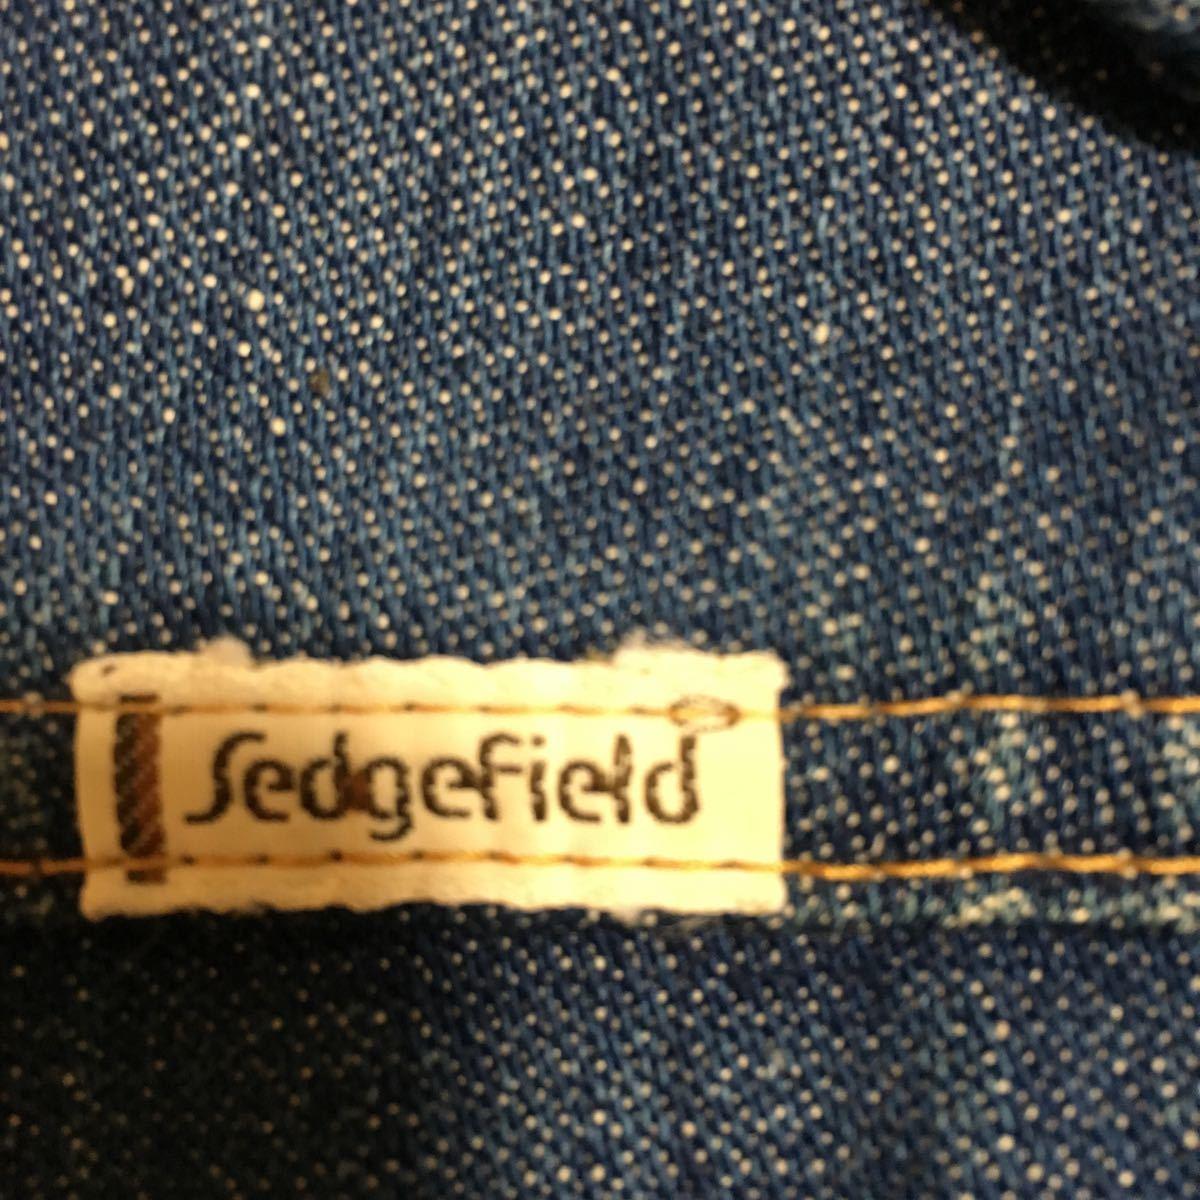 70s USA製 SEDGEFIELD DO-NOTHING デニムジャケット ウエスタンシャツ Sサイズ 古着 ヴィンテージ _画像4